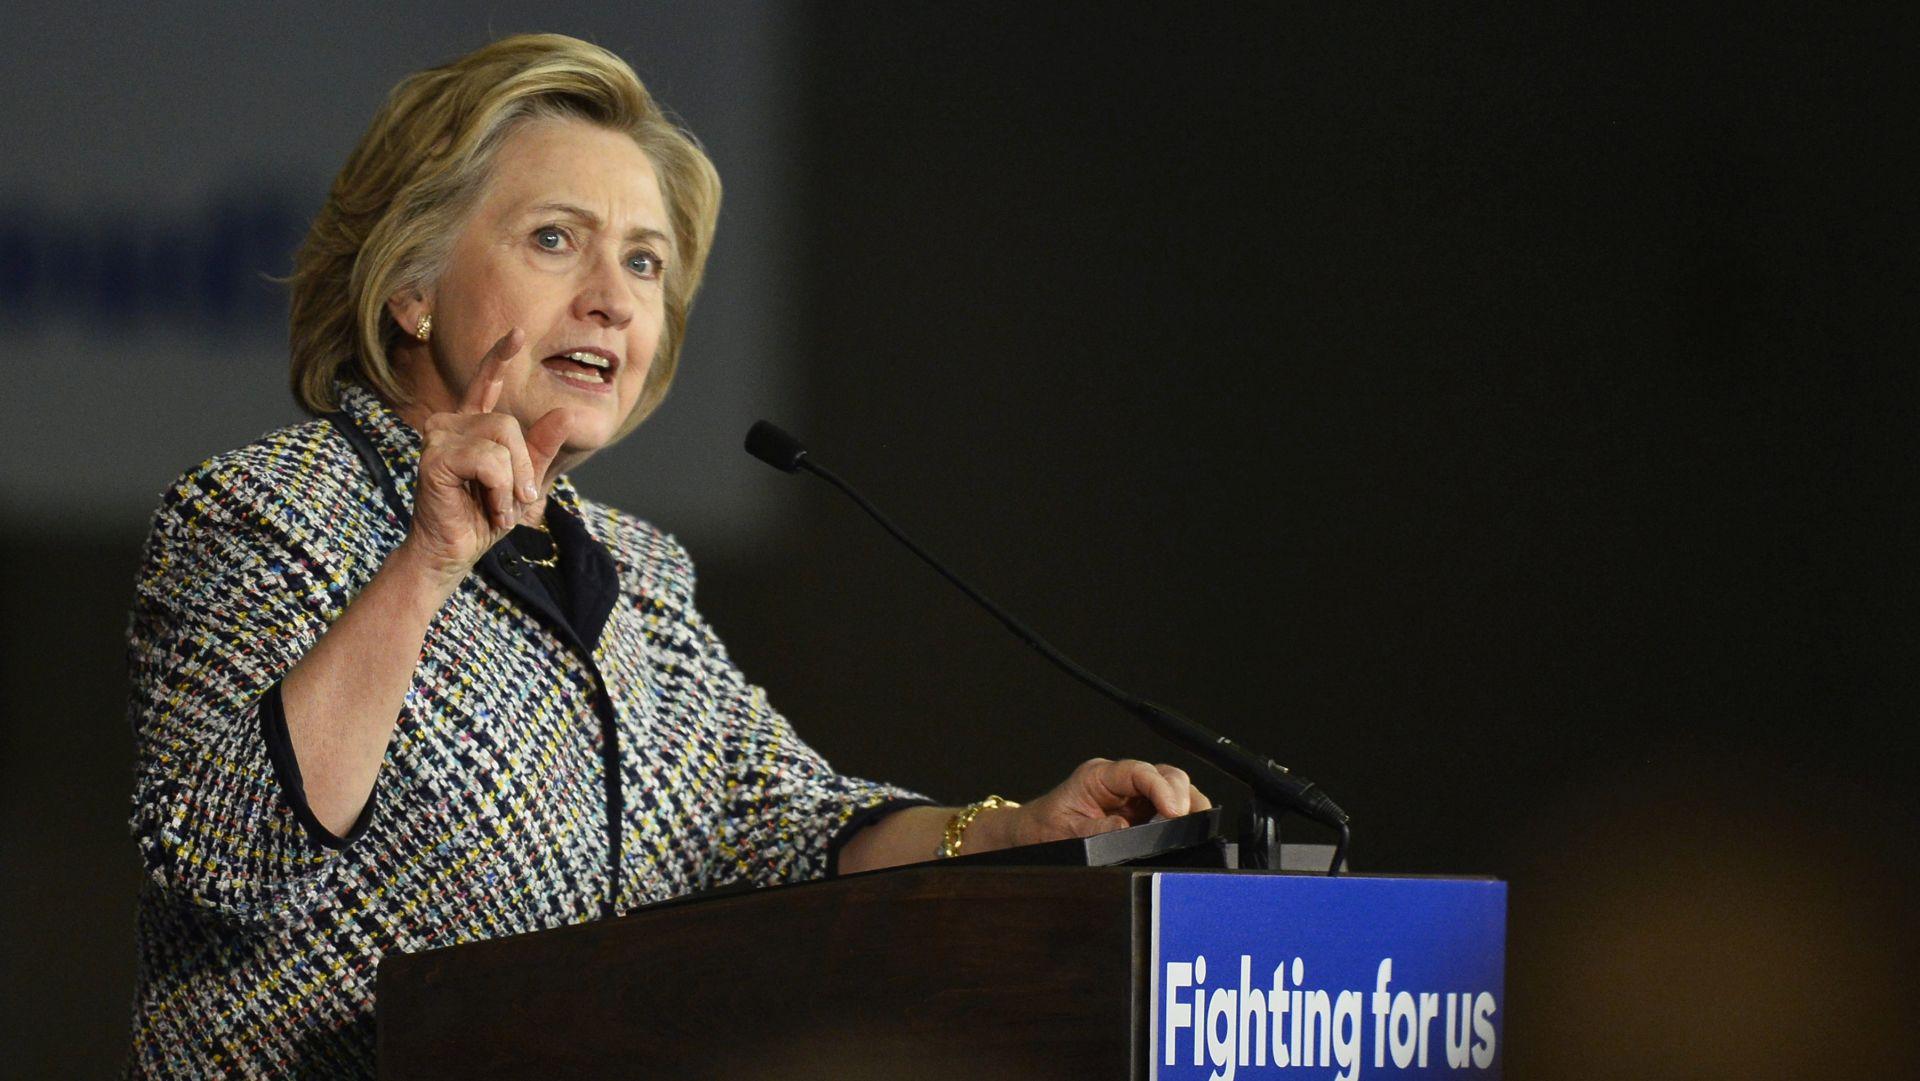 Hillary Clinton zatražila agresivniji pristup u borbi protiv IS-a